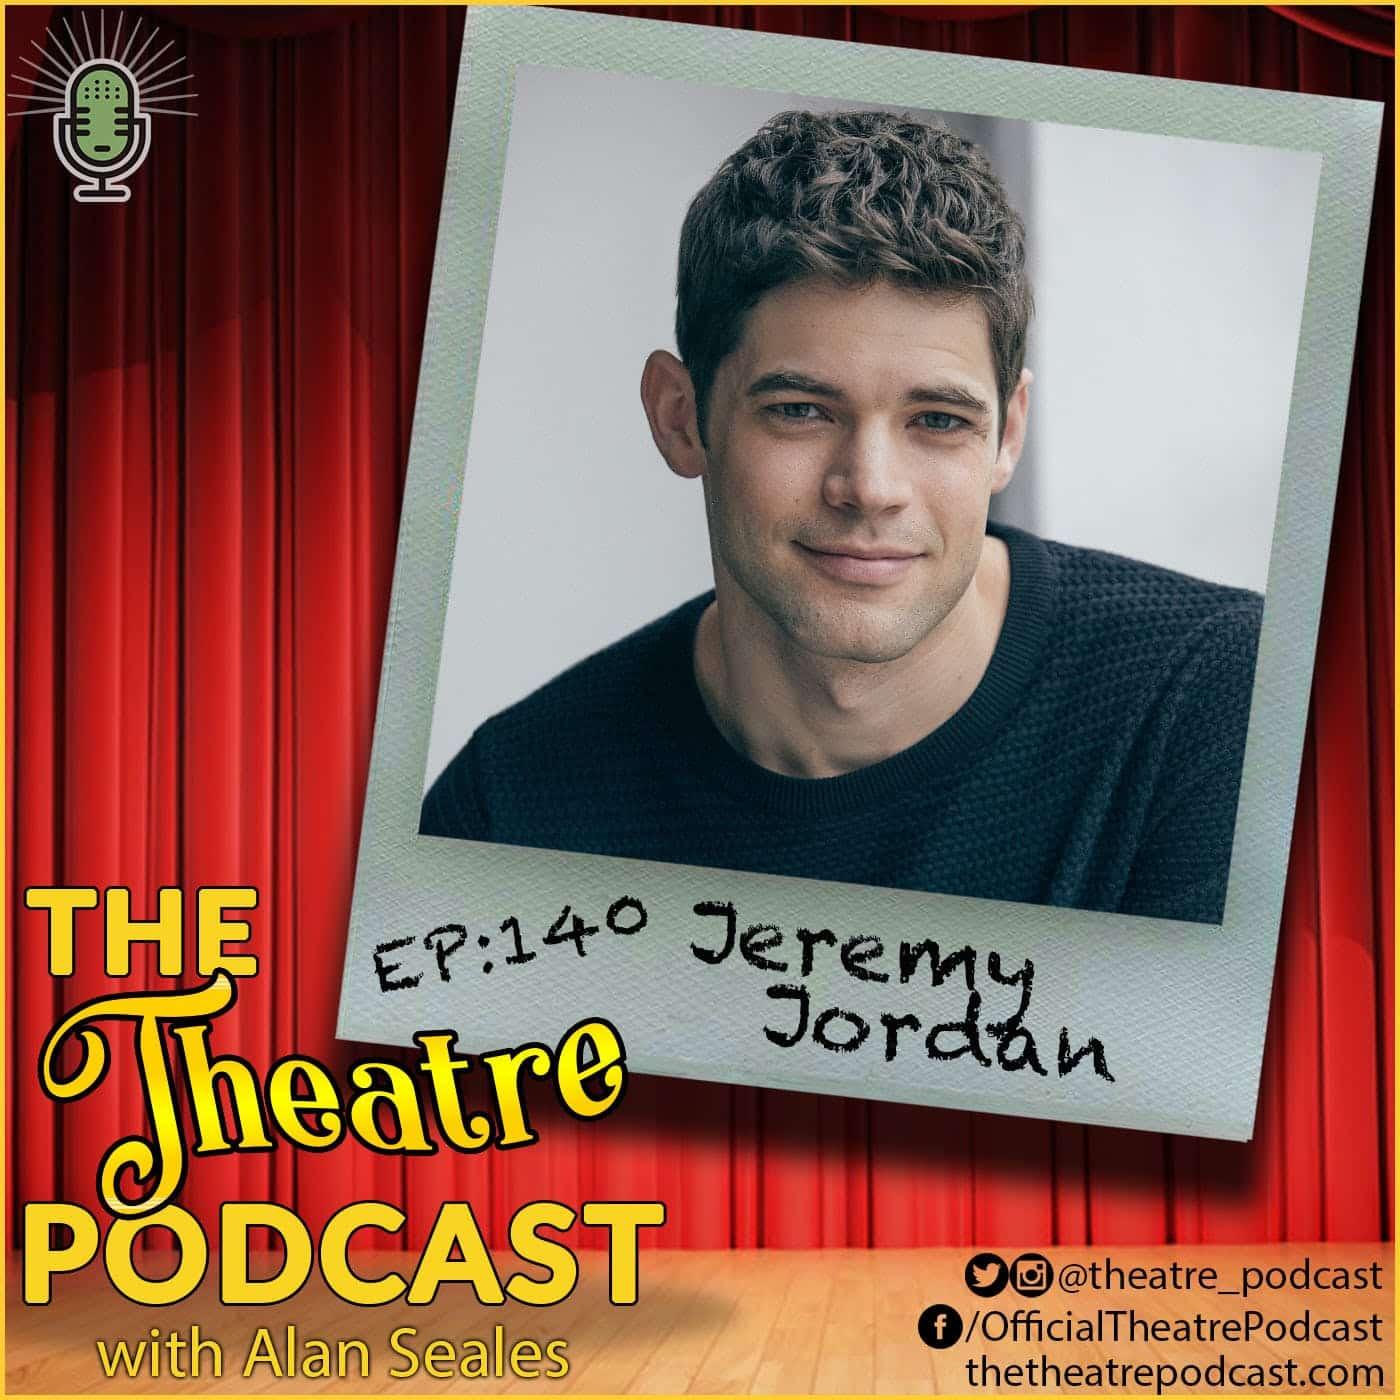 Ep140 - Jeremy Jordan: Newsies, Supergirl, Smash, Bonnie & Clyde, Rock of Ages